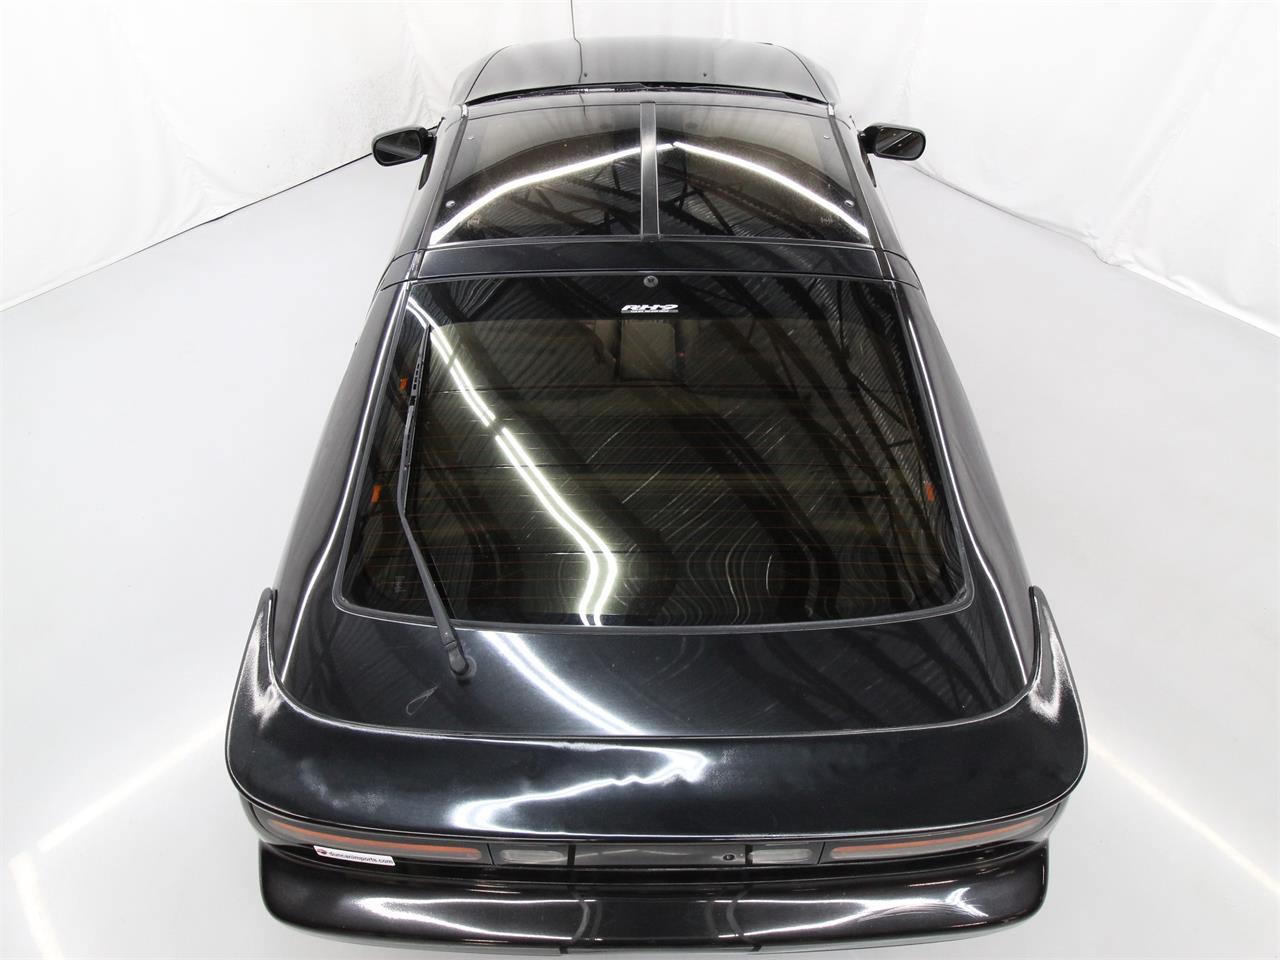 1990 Nissan Fairlady (CC-1293599) for sale in Christiansburg, Virginia